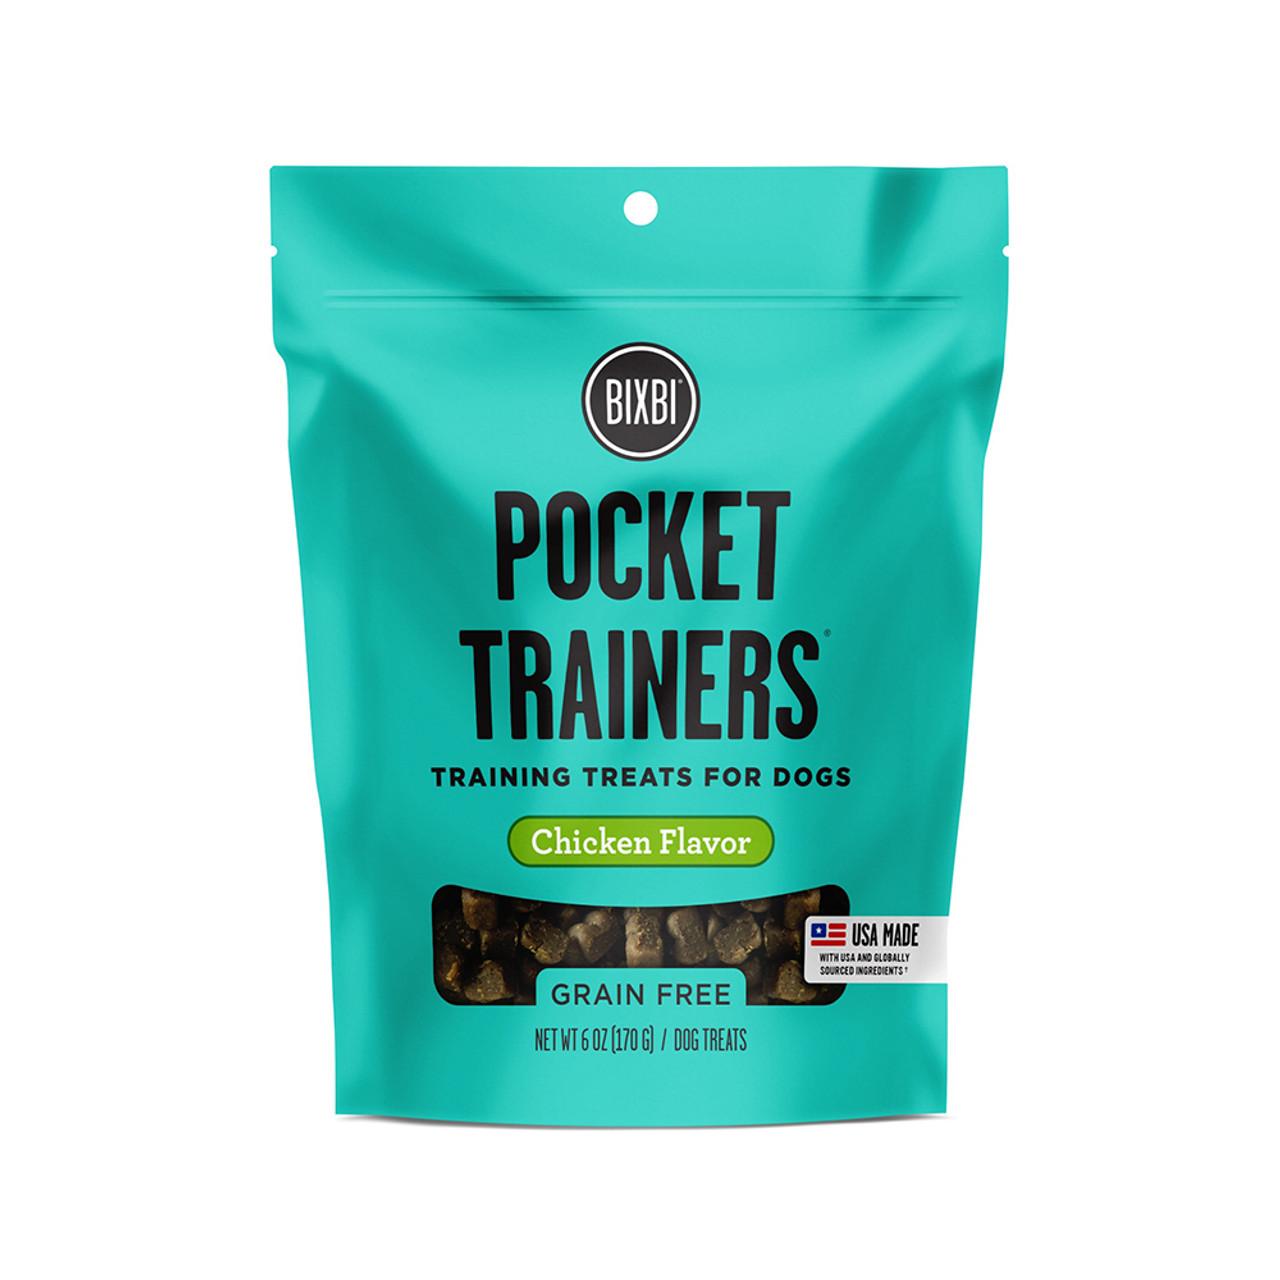 Bixbi Pocket Trainers Chicken Flavor Dog Training Treats - Front